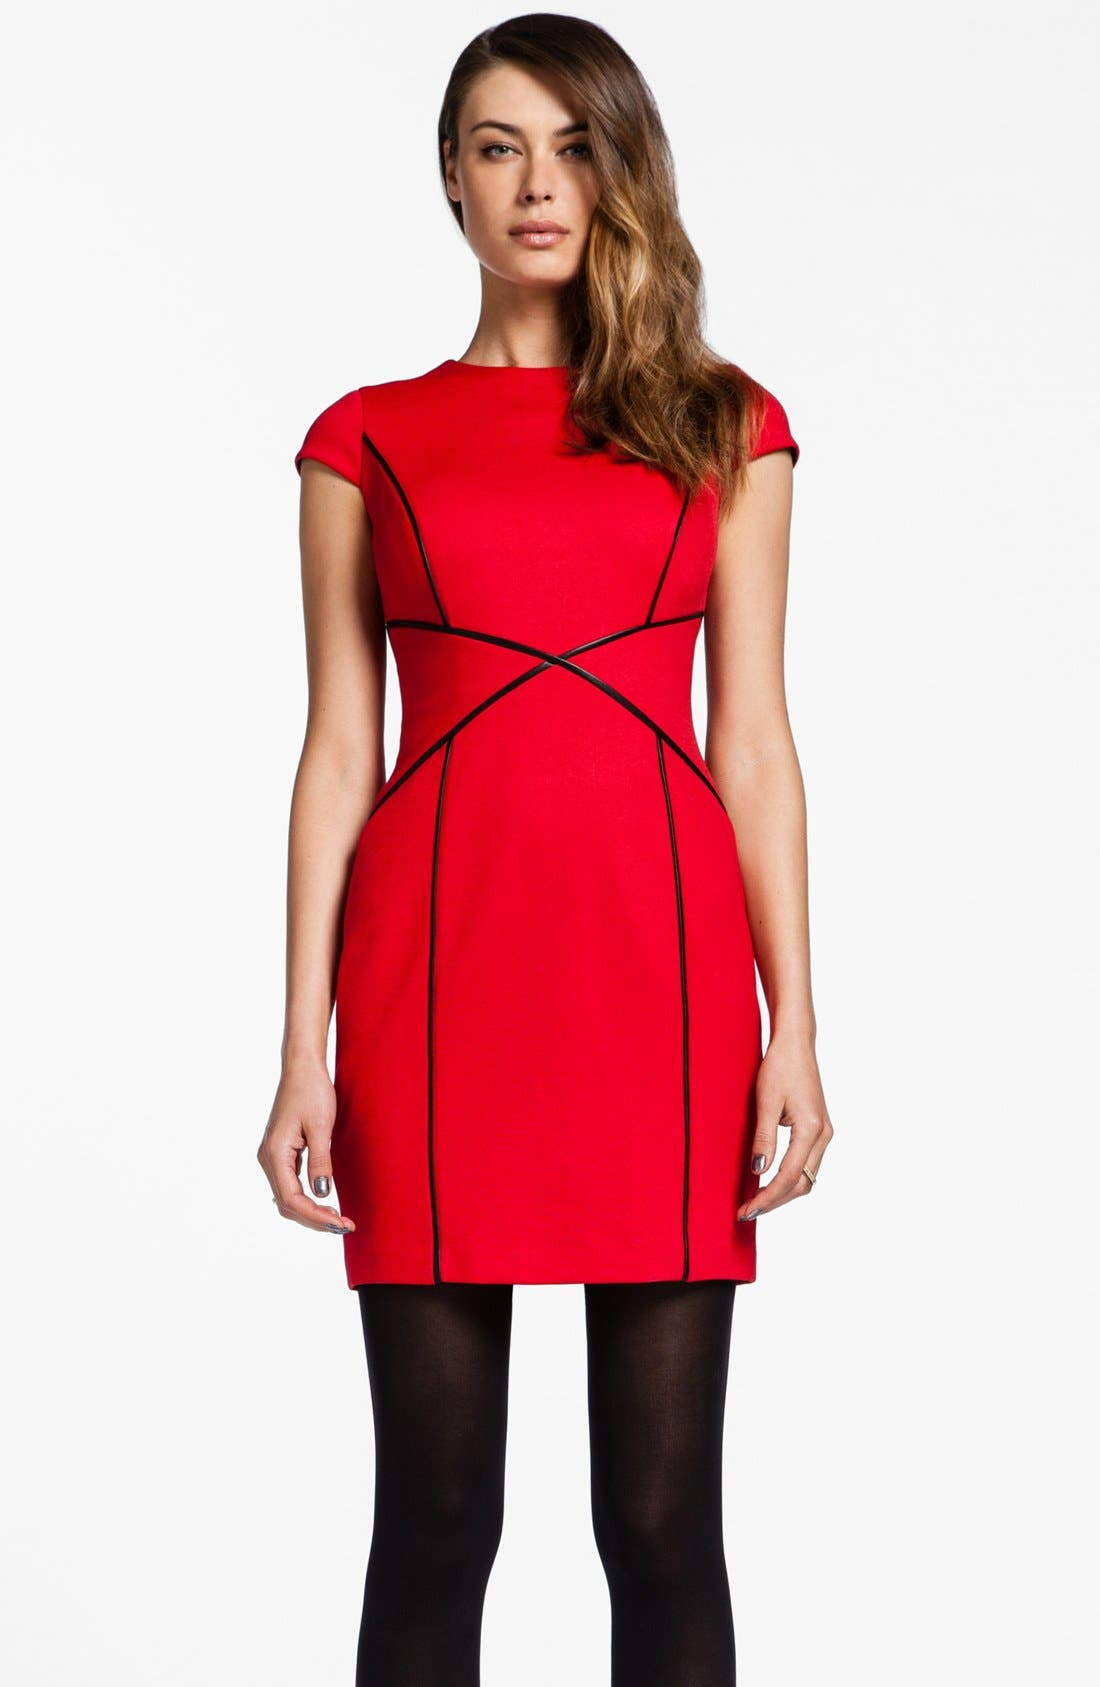 Main Image - Cynthia Steffe 'Bristol' Faux Leather Trim Sheath Dress